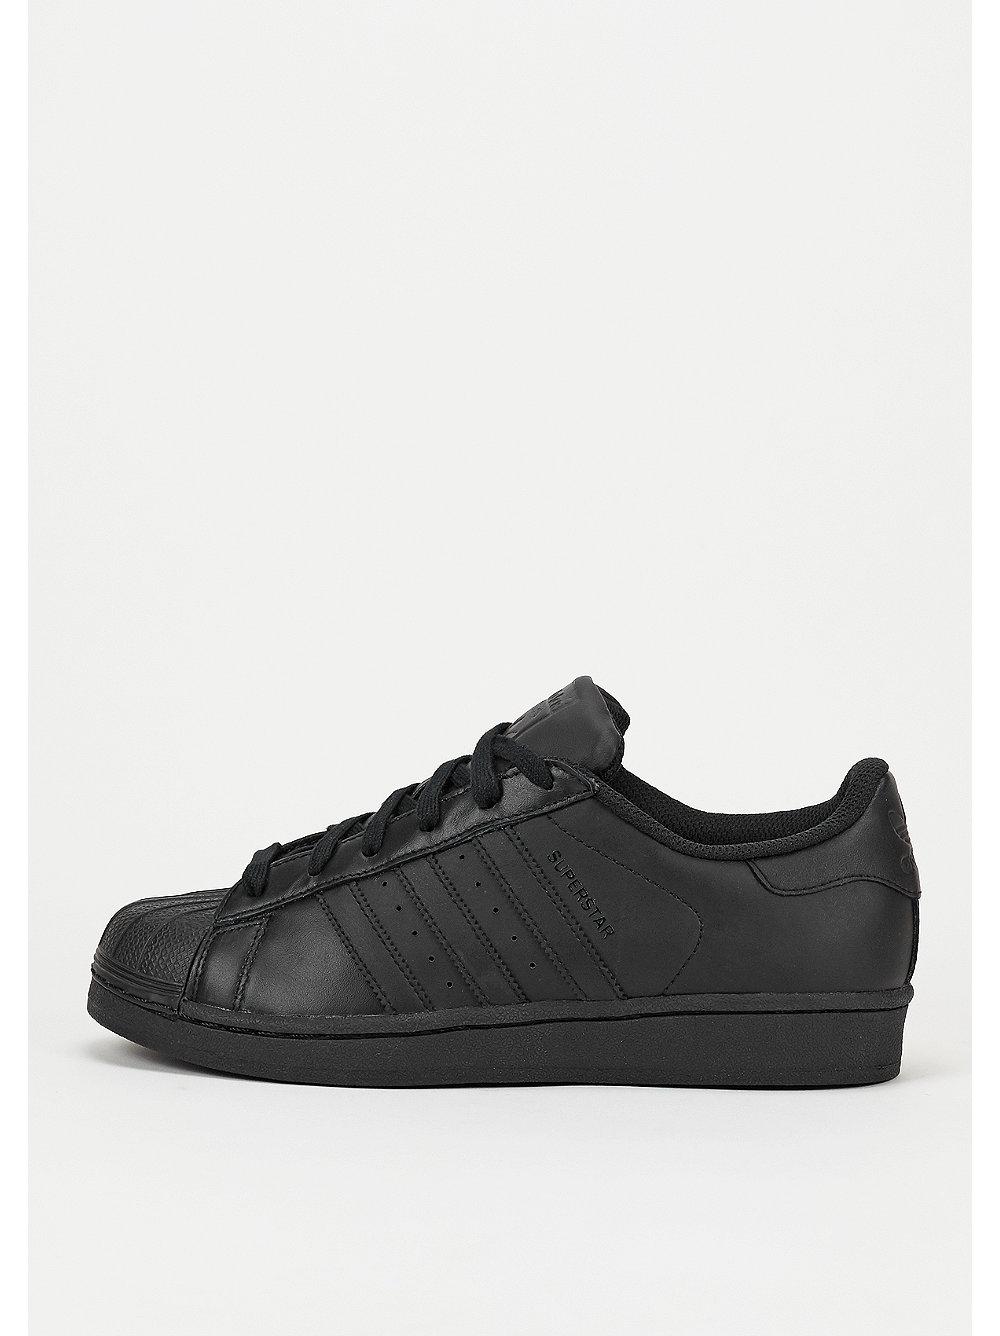 adidas Superstar black-black-black